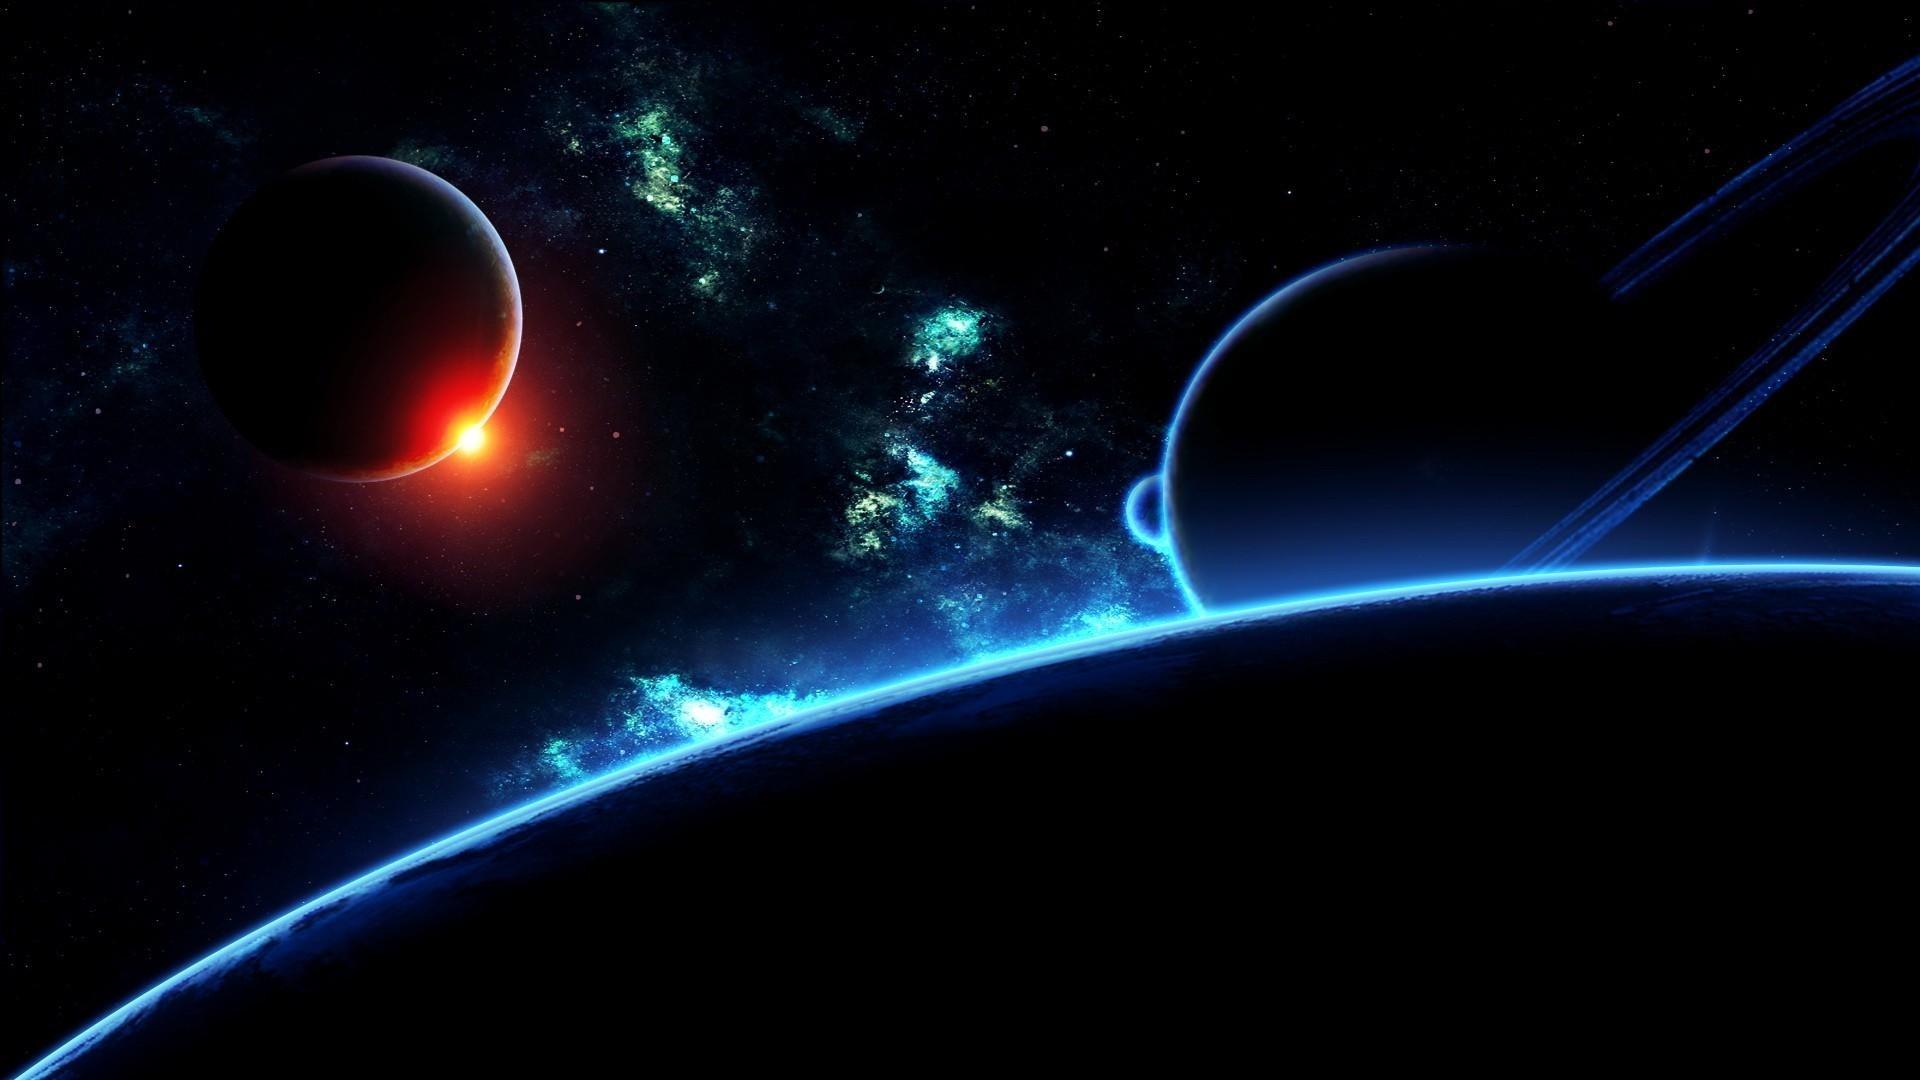 Wallpaper Dark Matter Behind The Planet Free Desktop Background